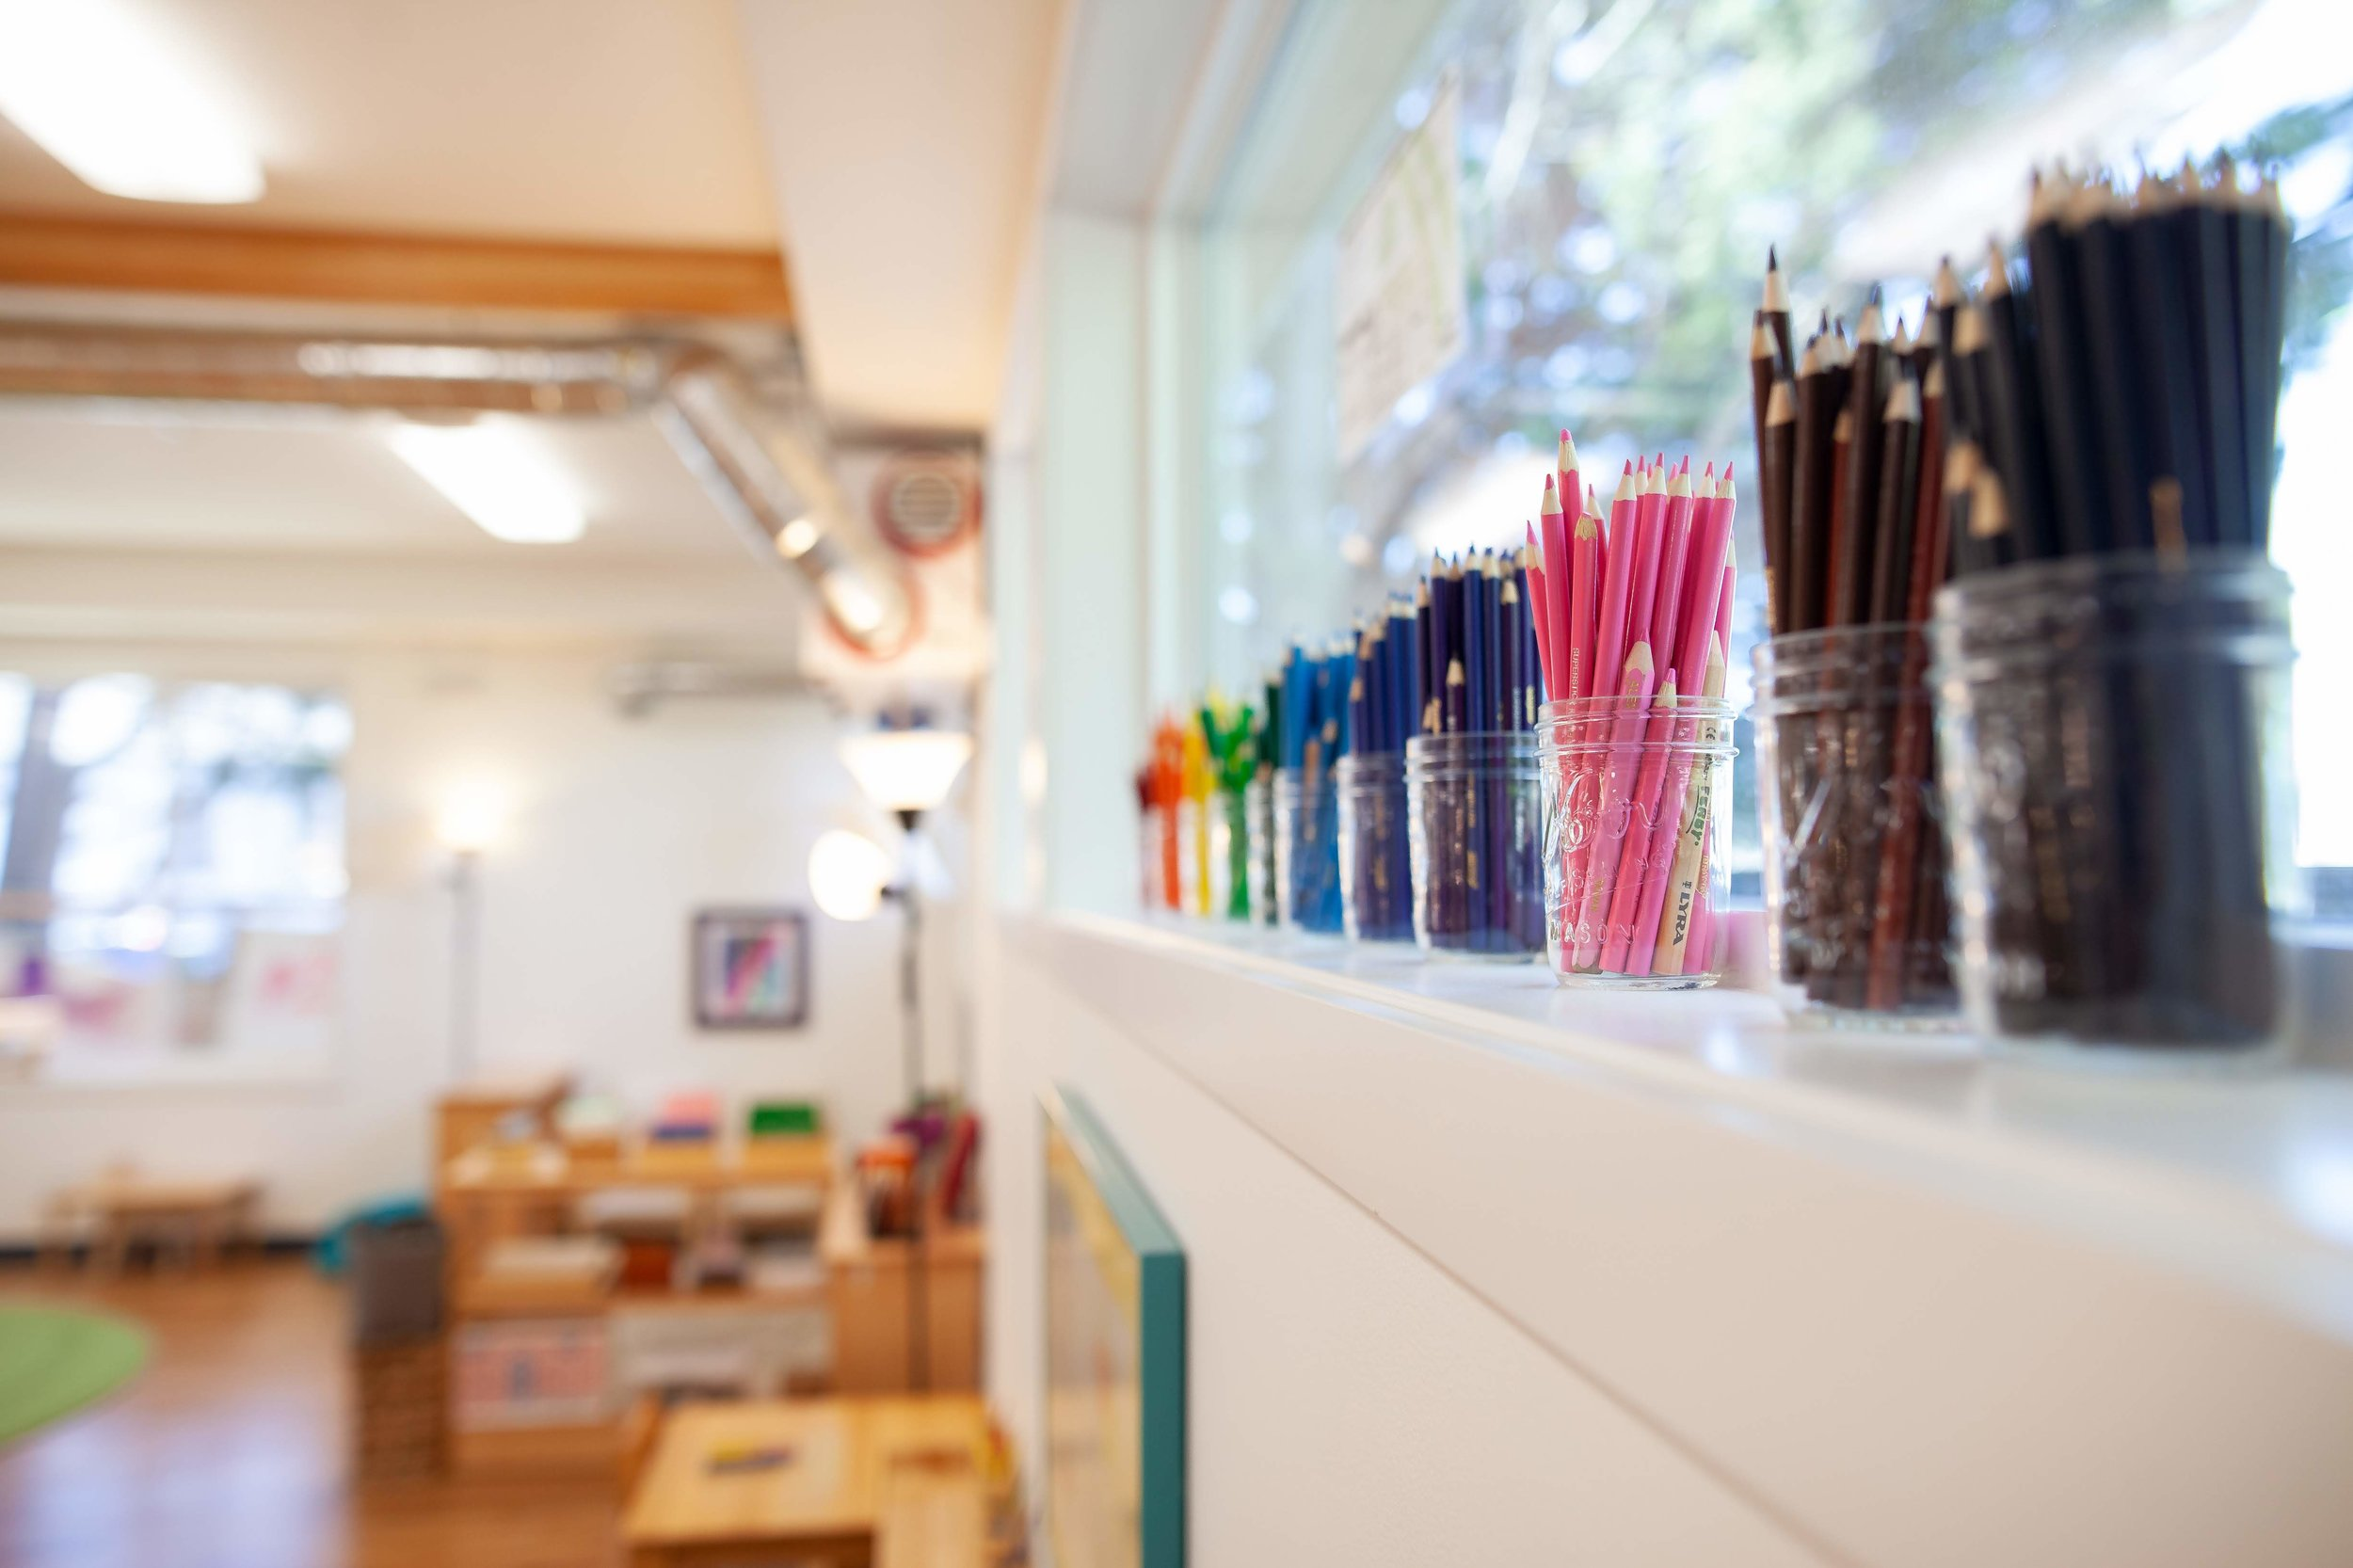 CH windowsill colored pencils.jpg